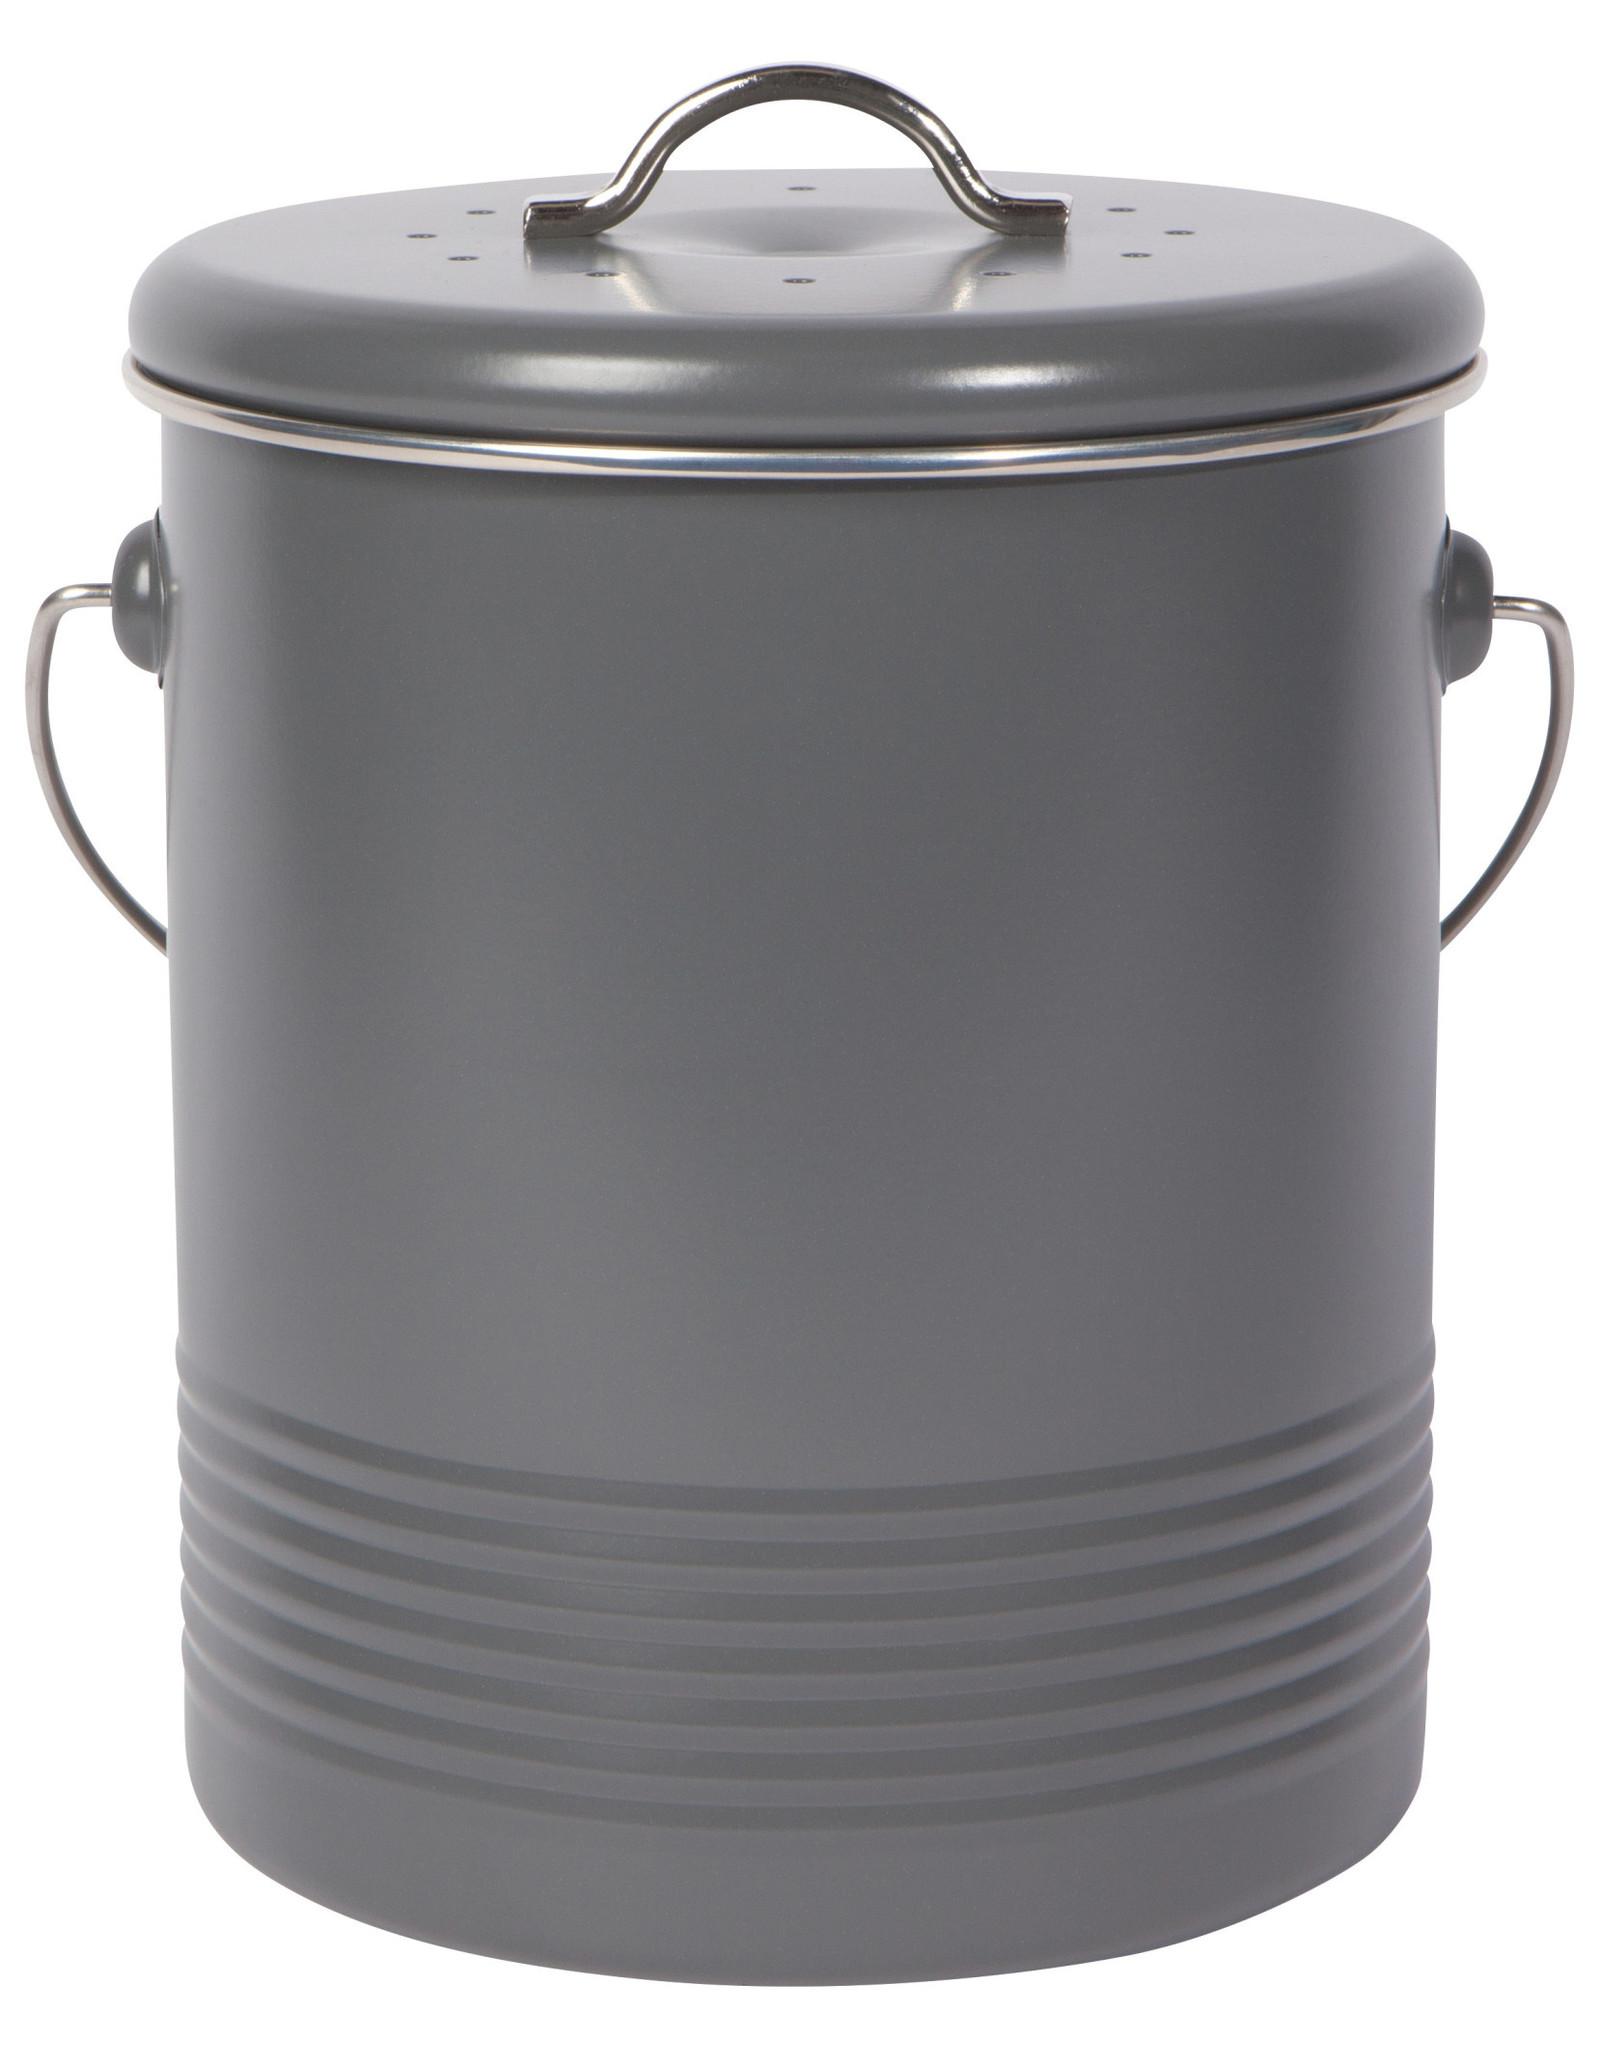 Danica Danica - Charcoal Compost Countertop Bin